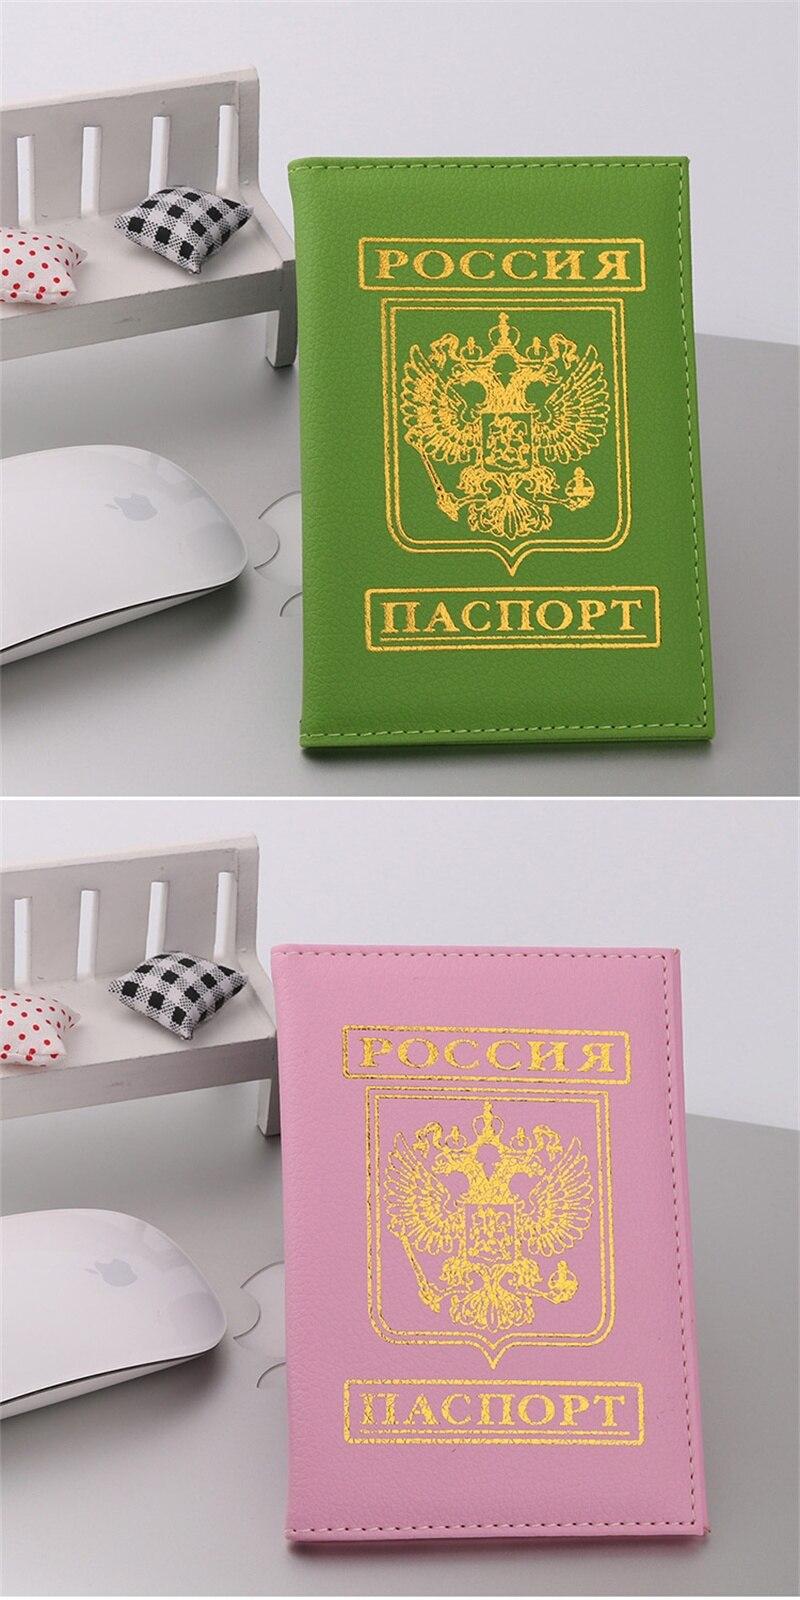 russia-double-eagle-passport-d8